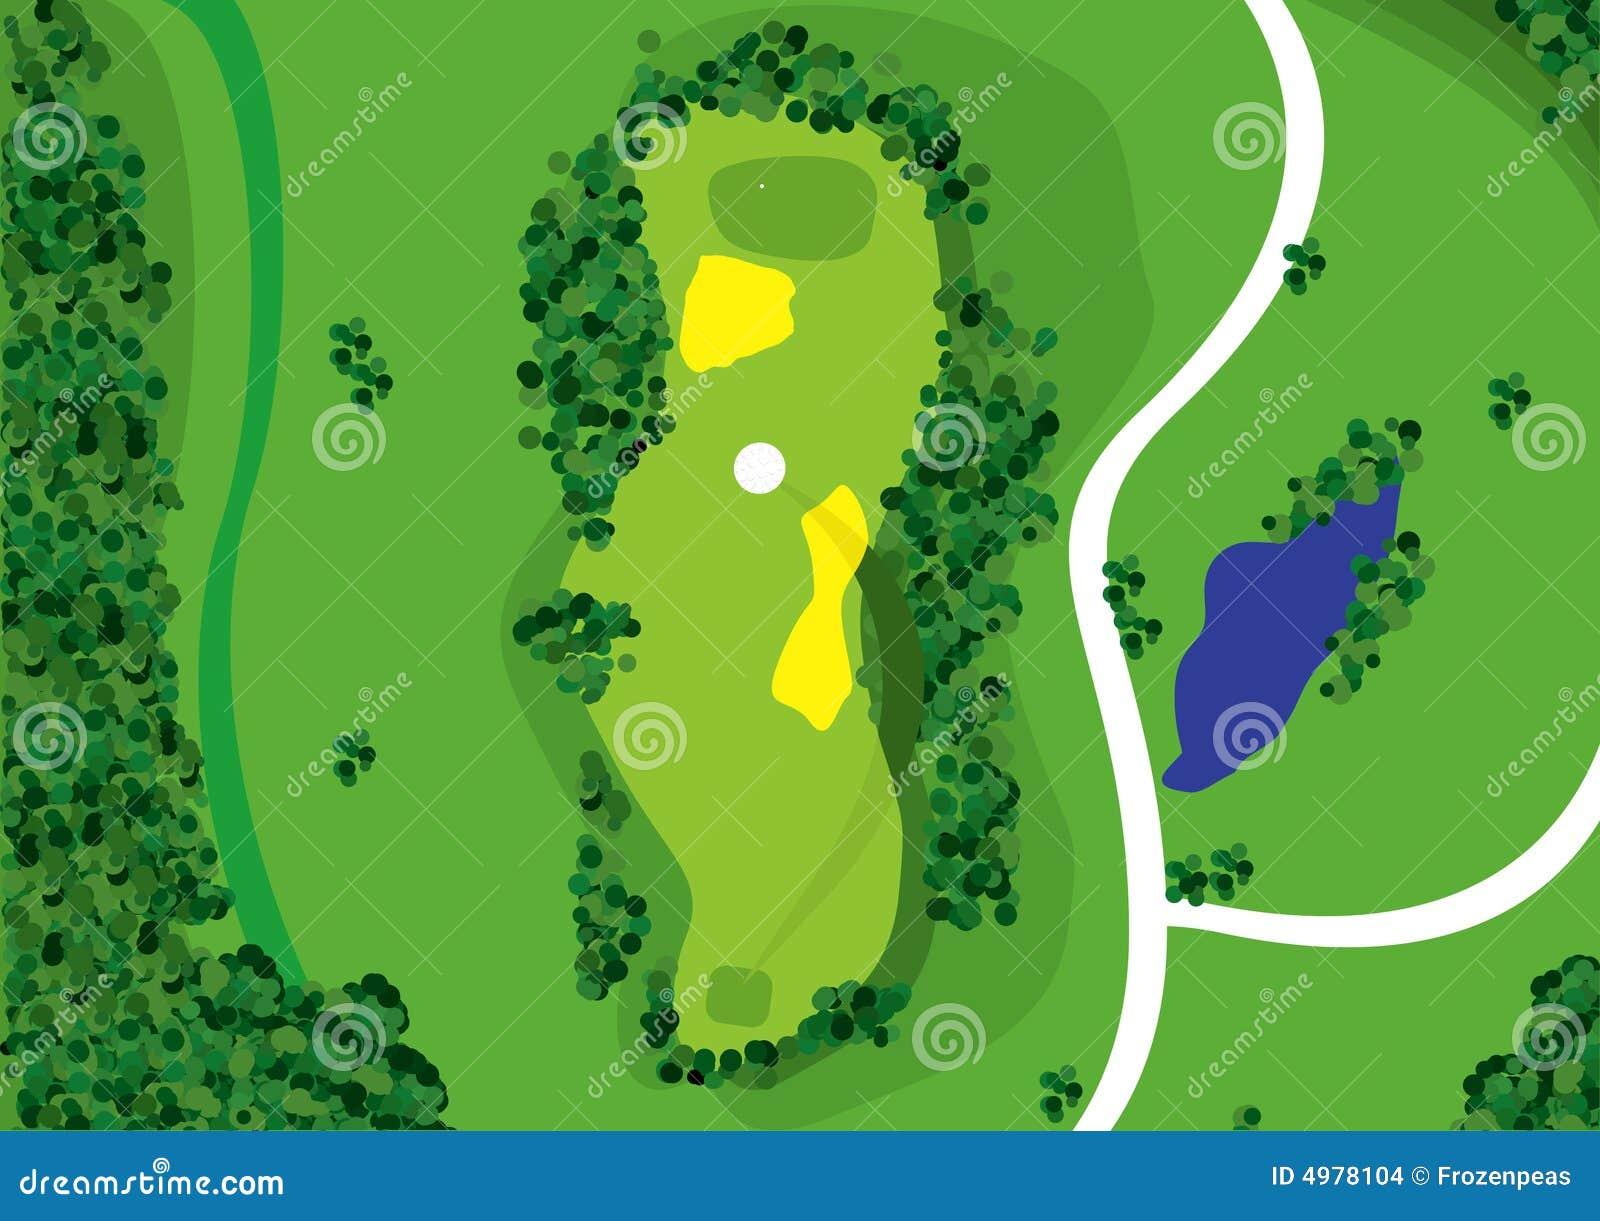 Small garden cartoon - Golf Course Stock Images Image 4978104